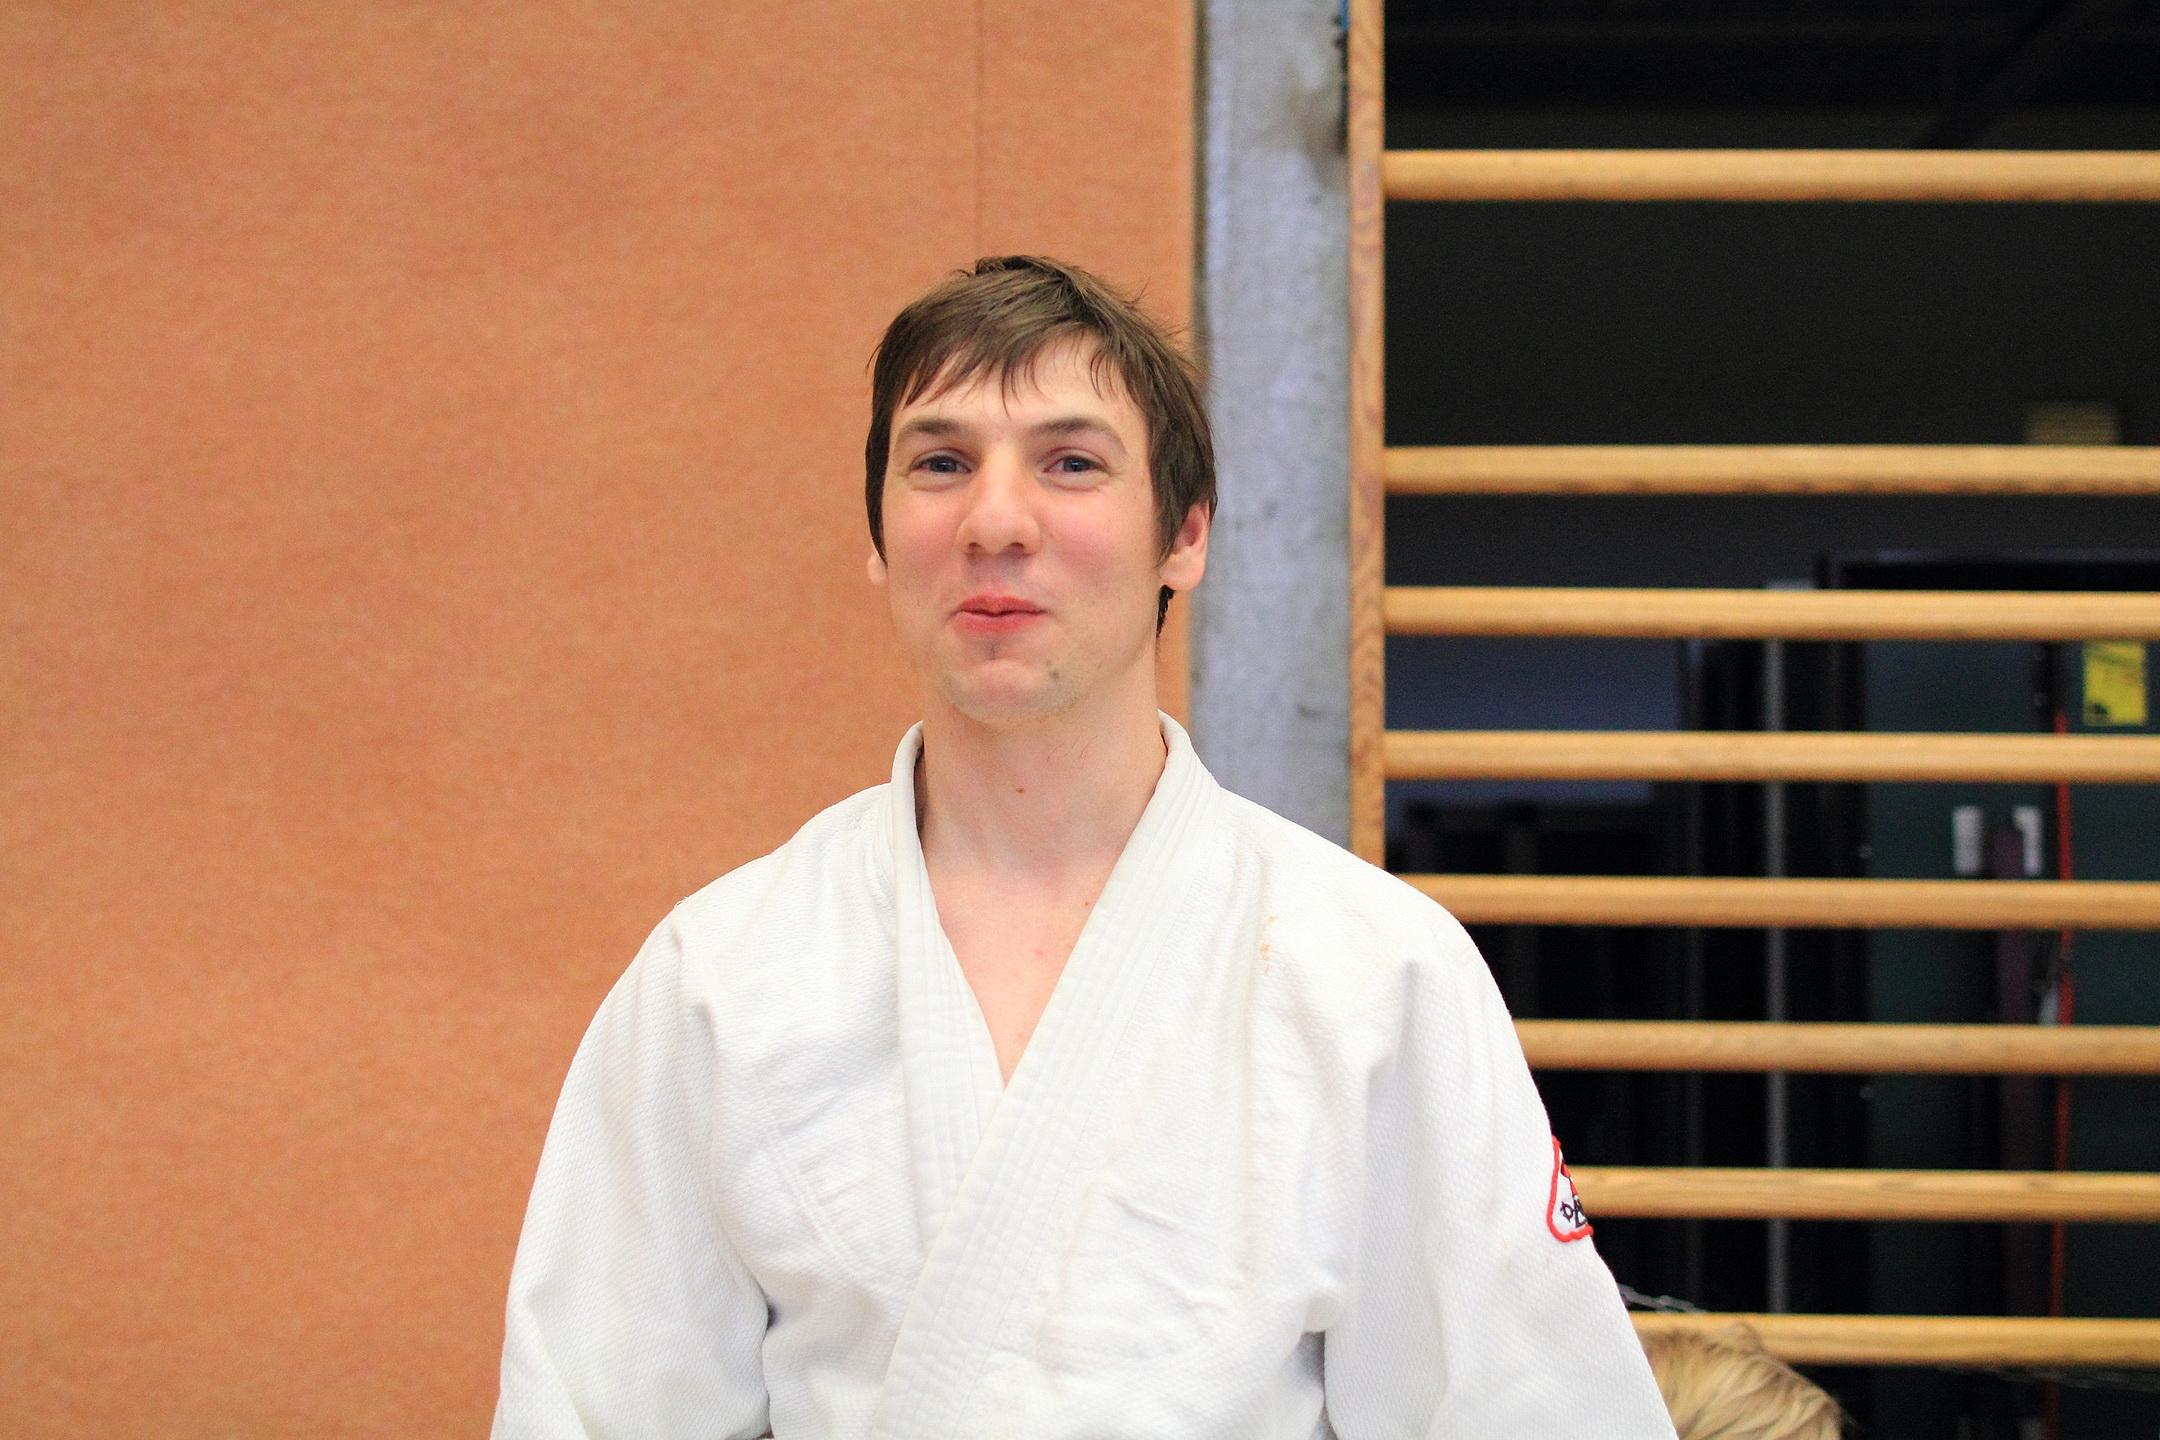 2016-Nikolausturnier Judokas Schwedt (9)